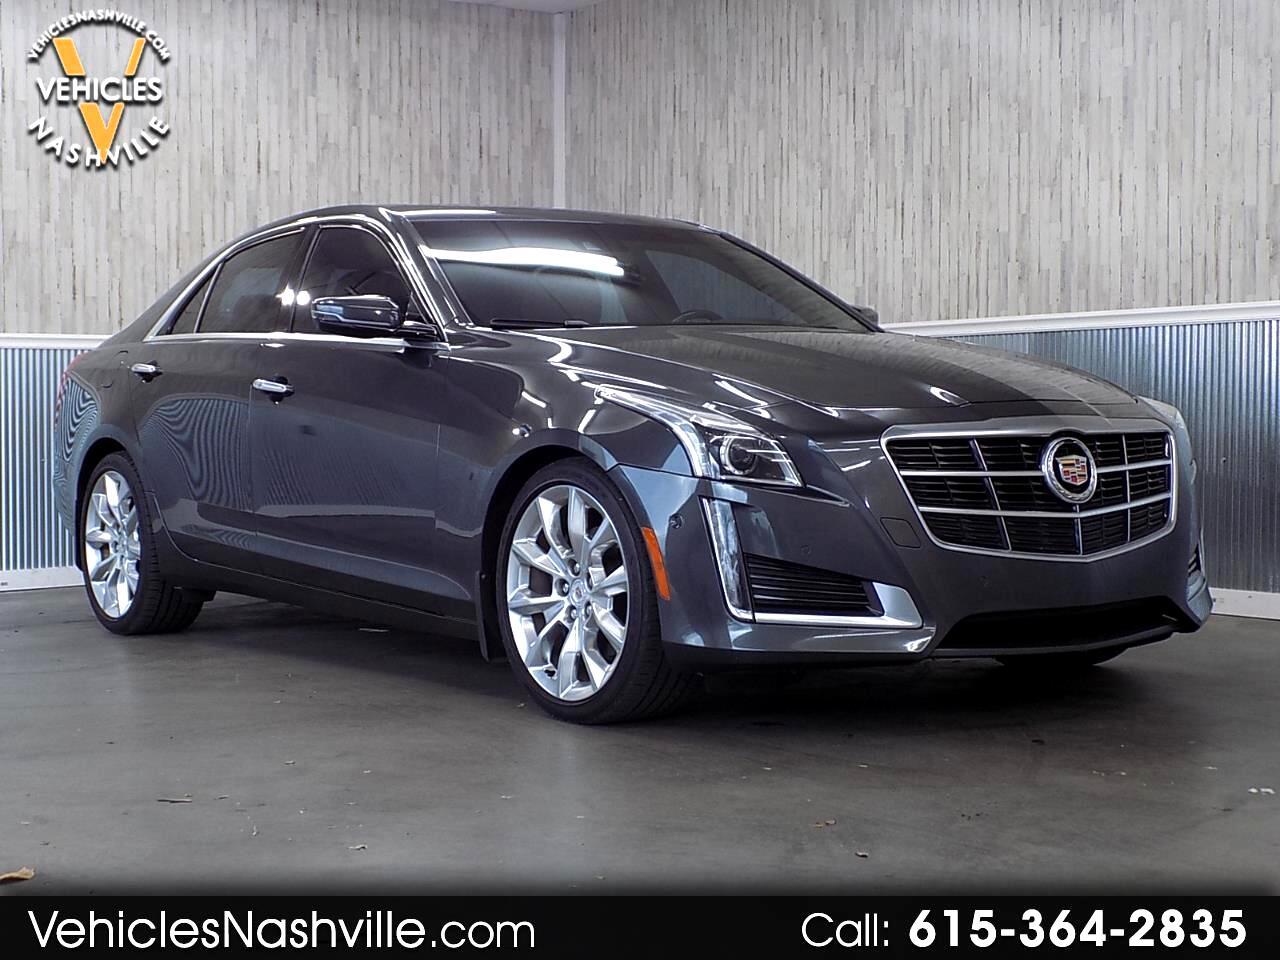 2014 Cadillac CTS 3.6L Performance RWD